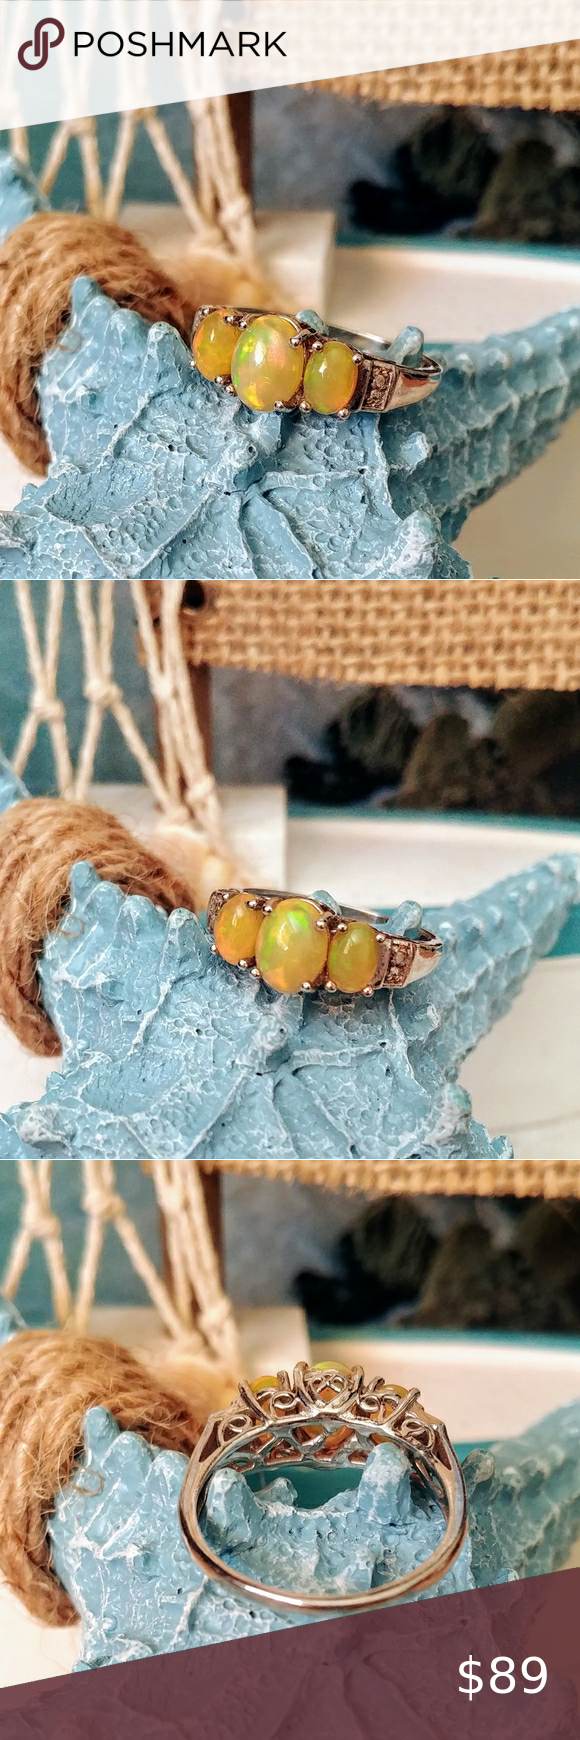 Spotted while shopping on Poshmark: 3 STONE YELLOW FIRE OPAL RING! #poshmark #fashion #shopping #style #Fashion Jewelry #Jewelry